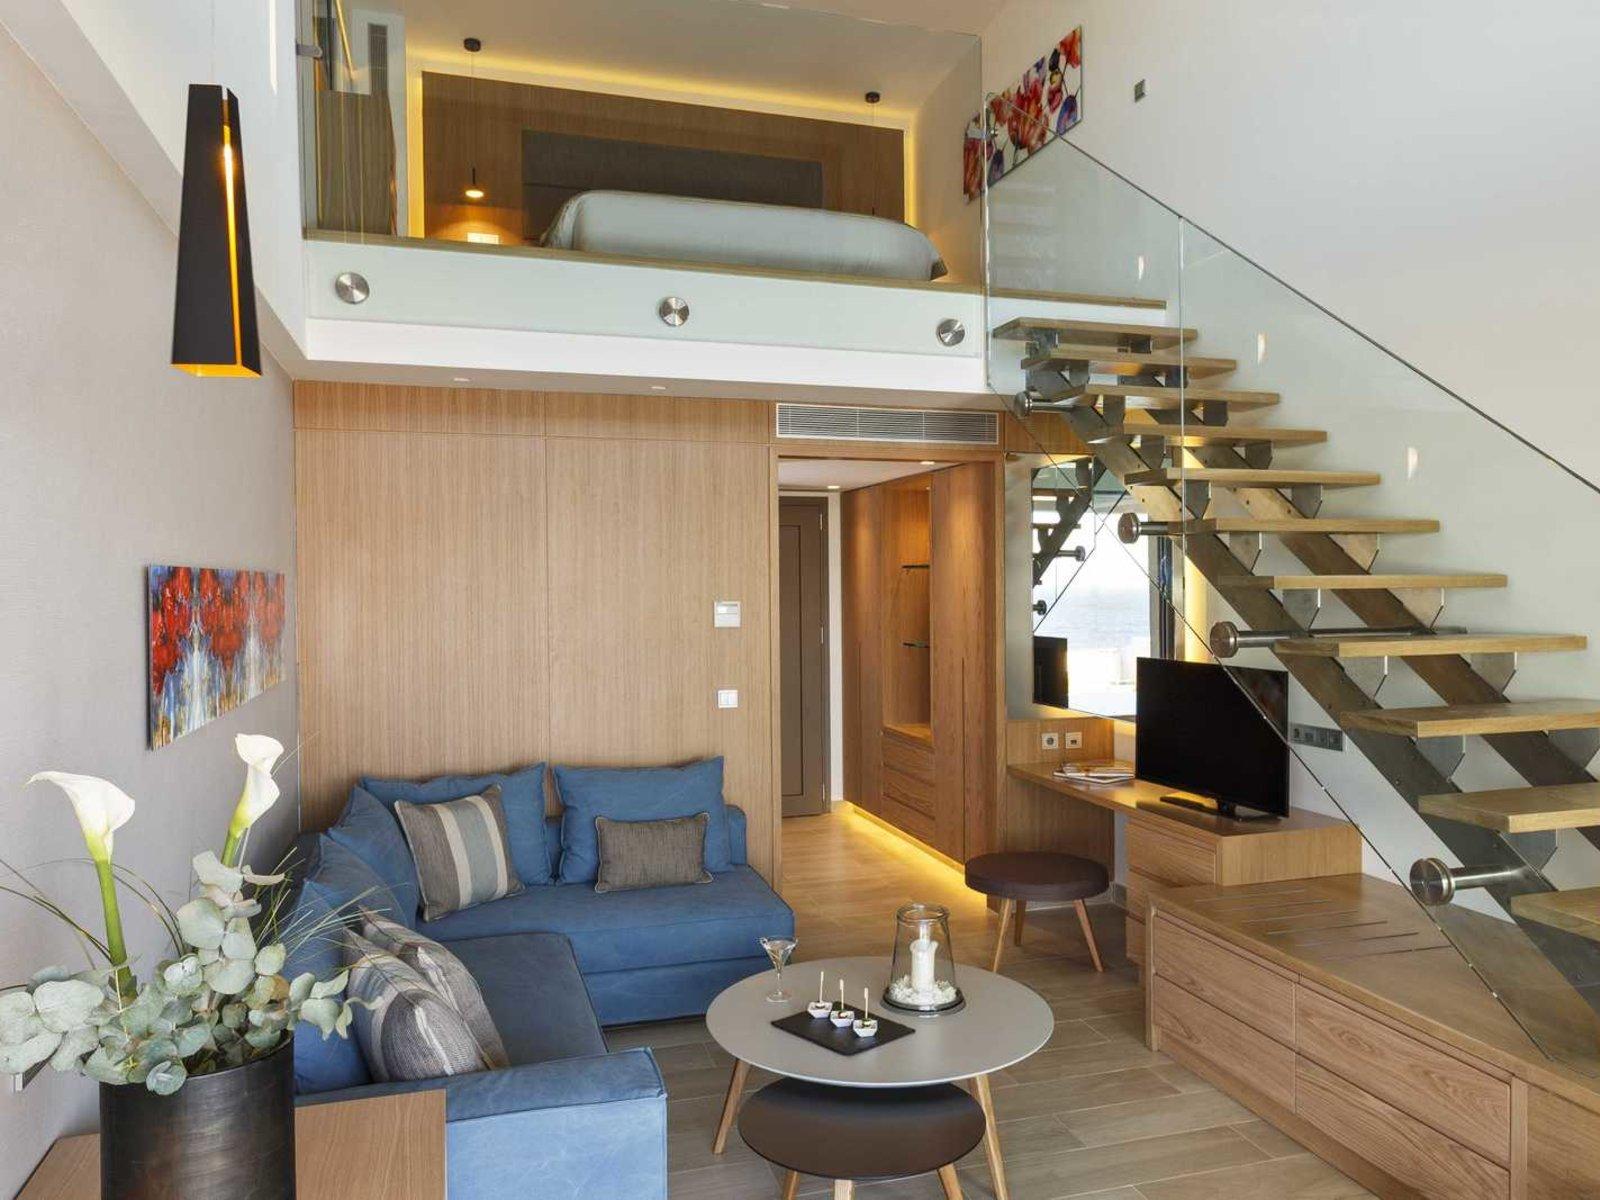 Wohnbeispiel Deluxe suite duplex swim up - red carpet room type